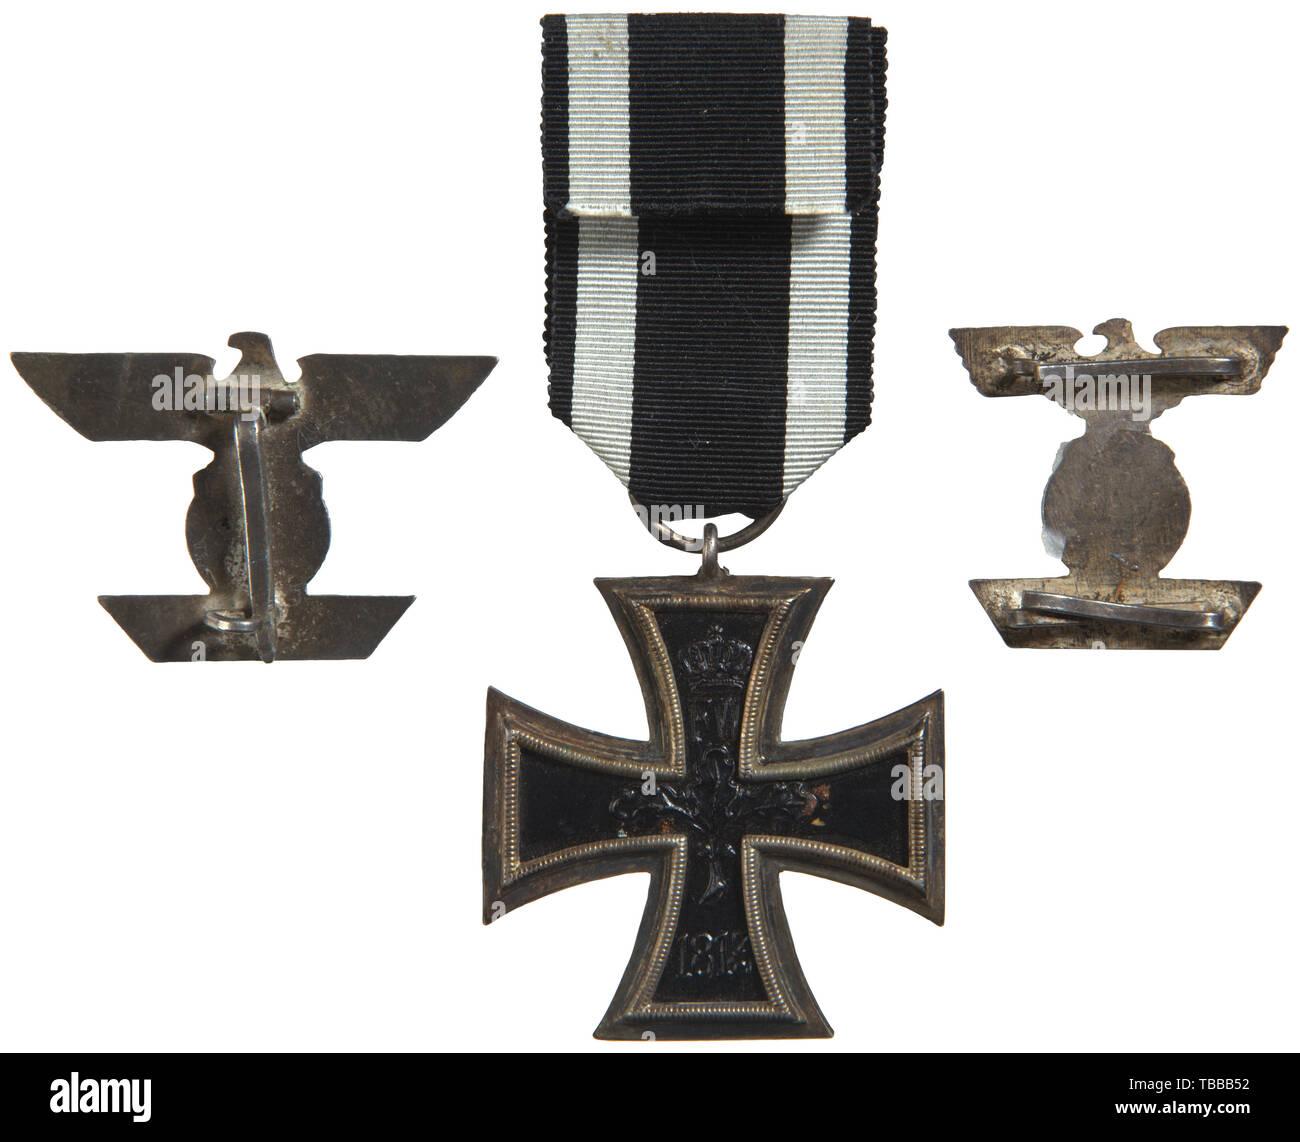 THE JOHN PEPERA COLLECTION, A Group of Three Awards, Iron